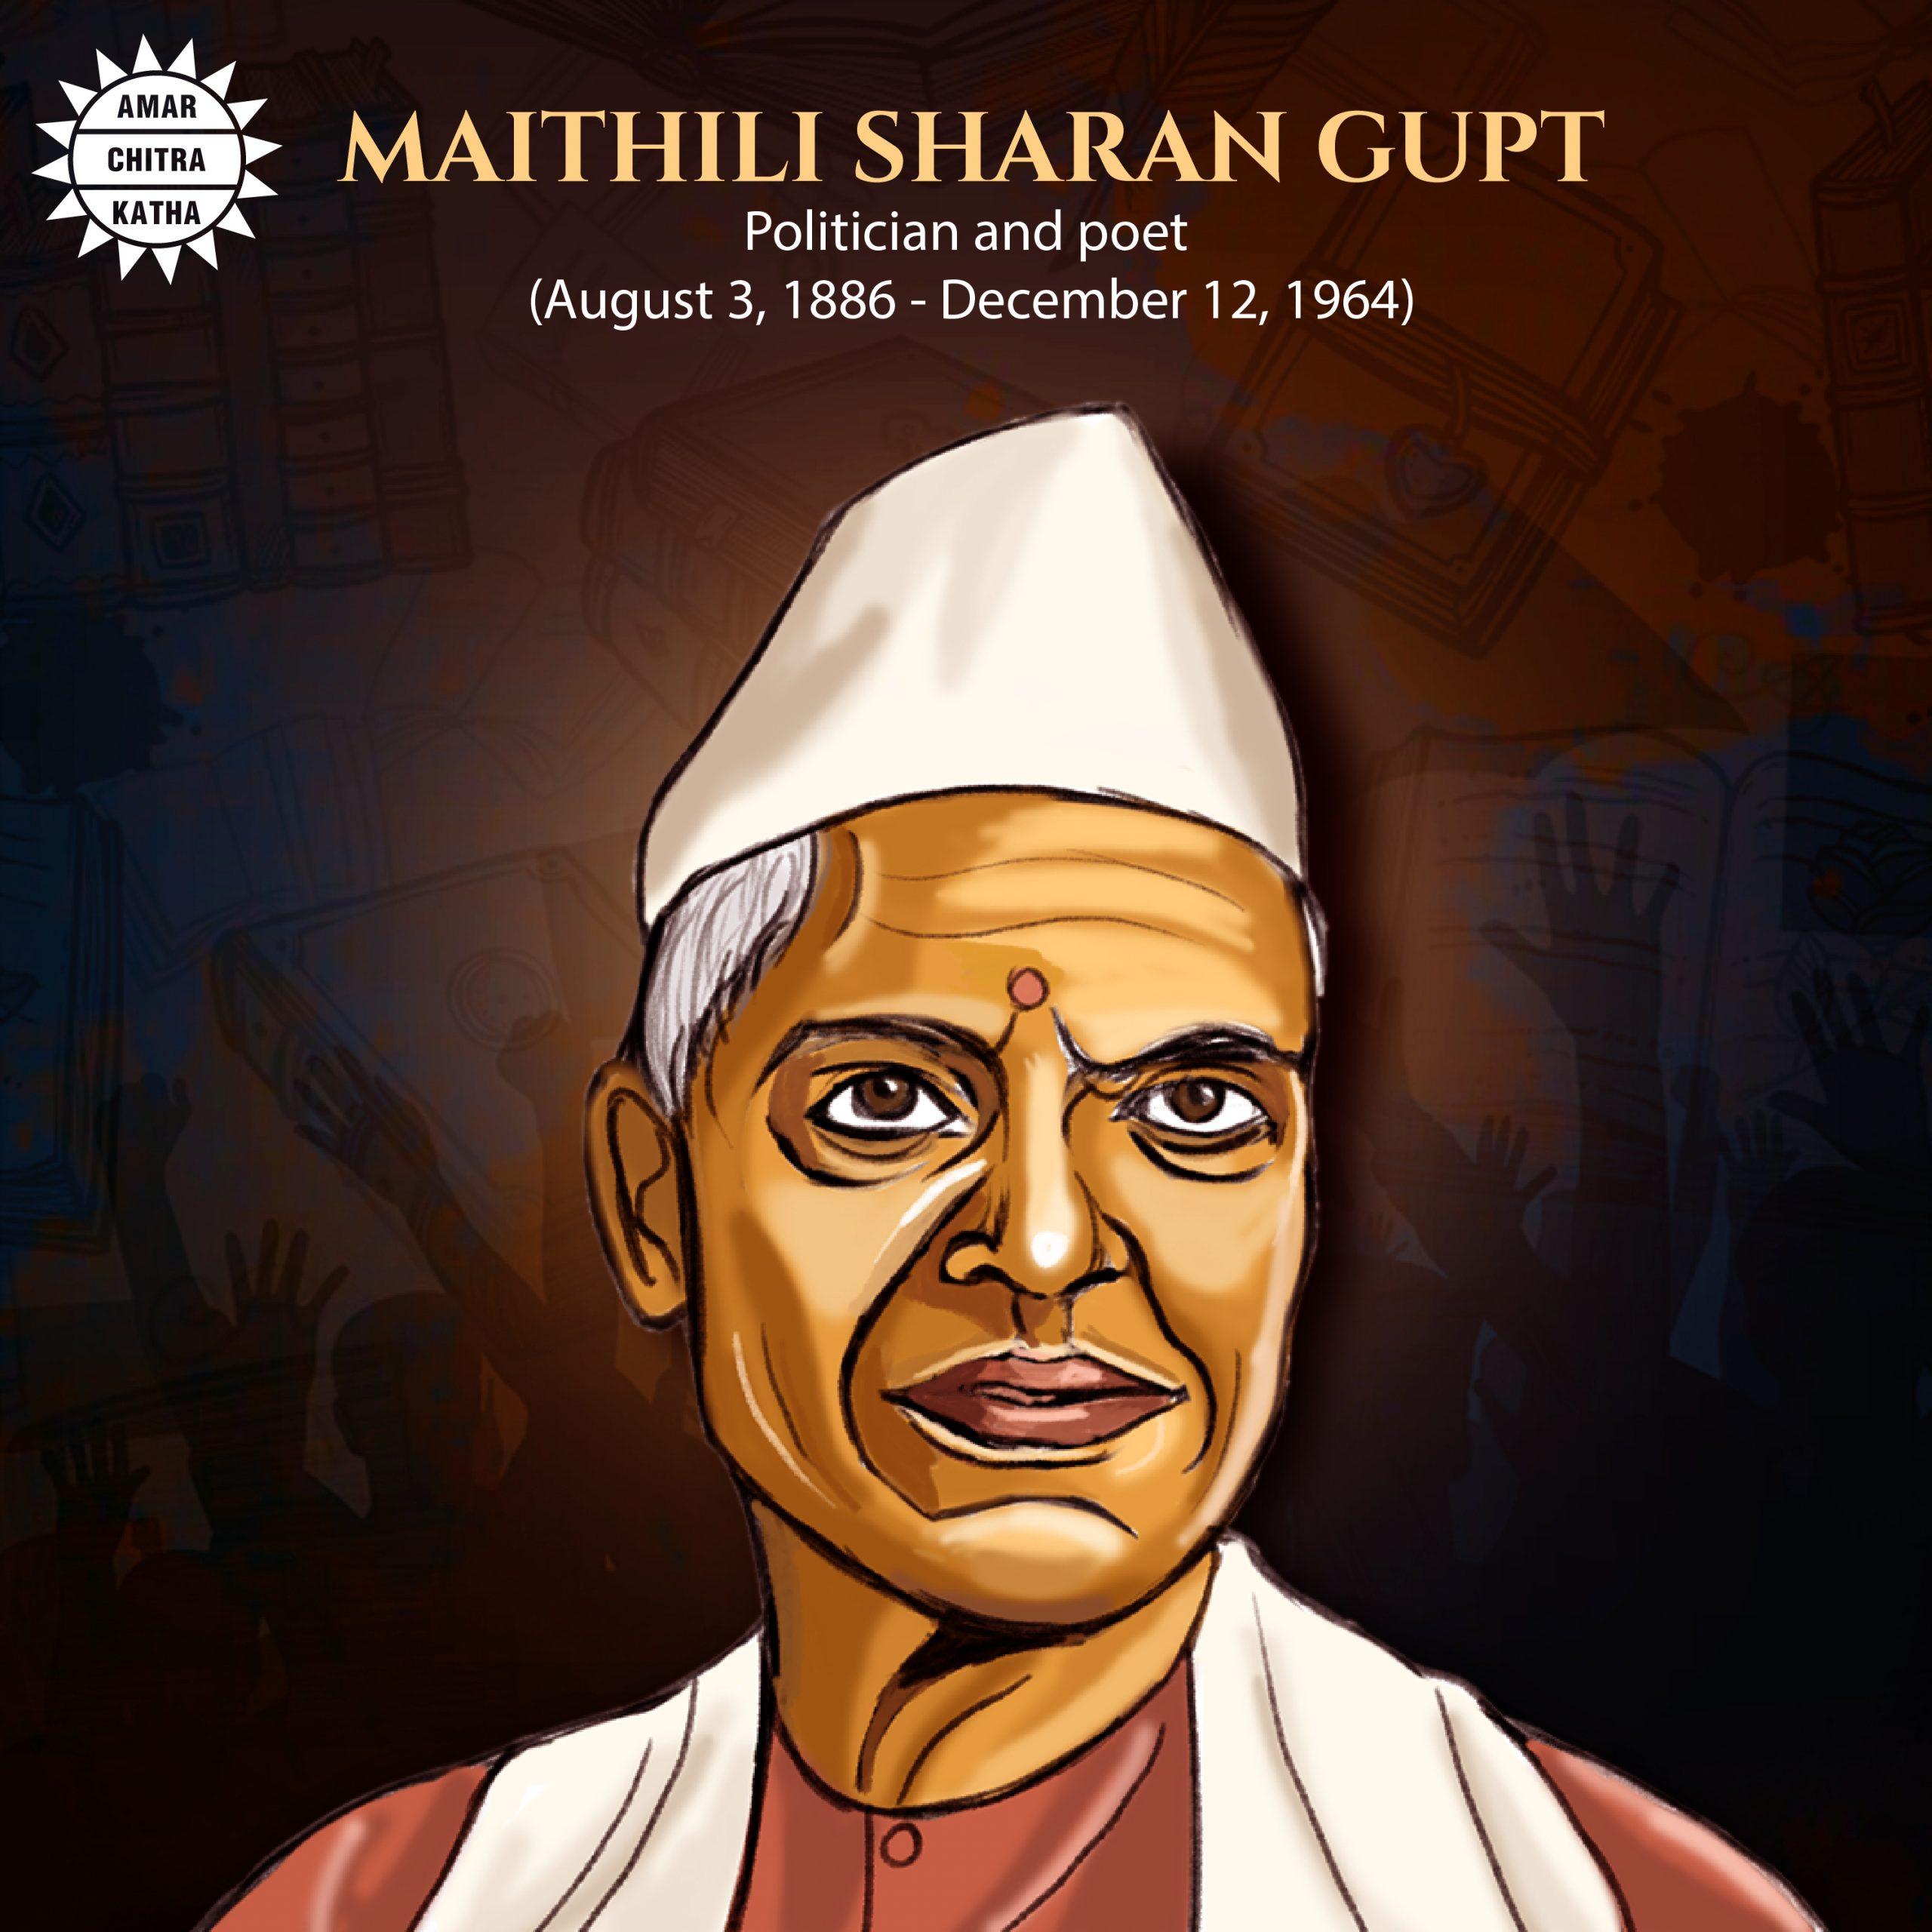 Maithili Sharan Gupt India's Freedom Fighter Poet